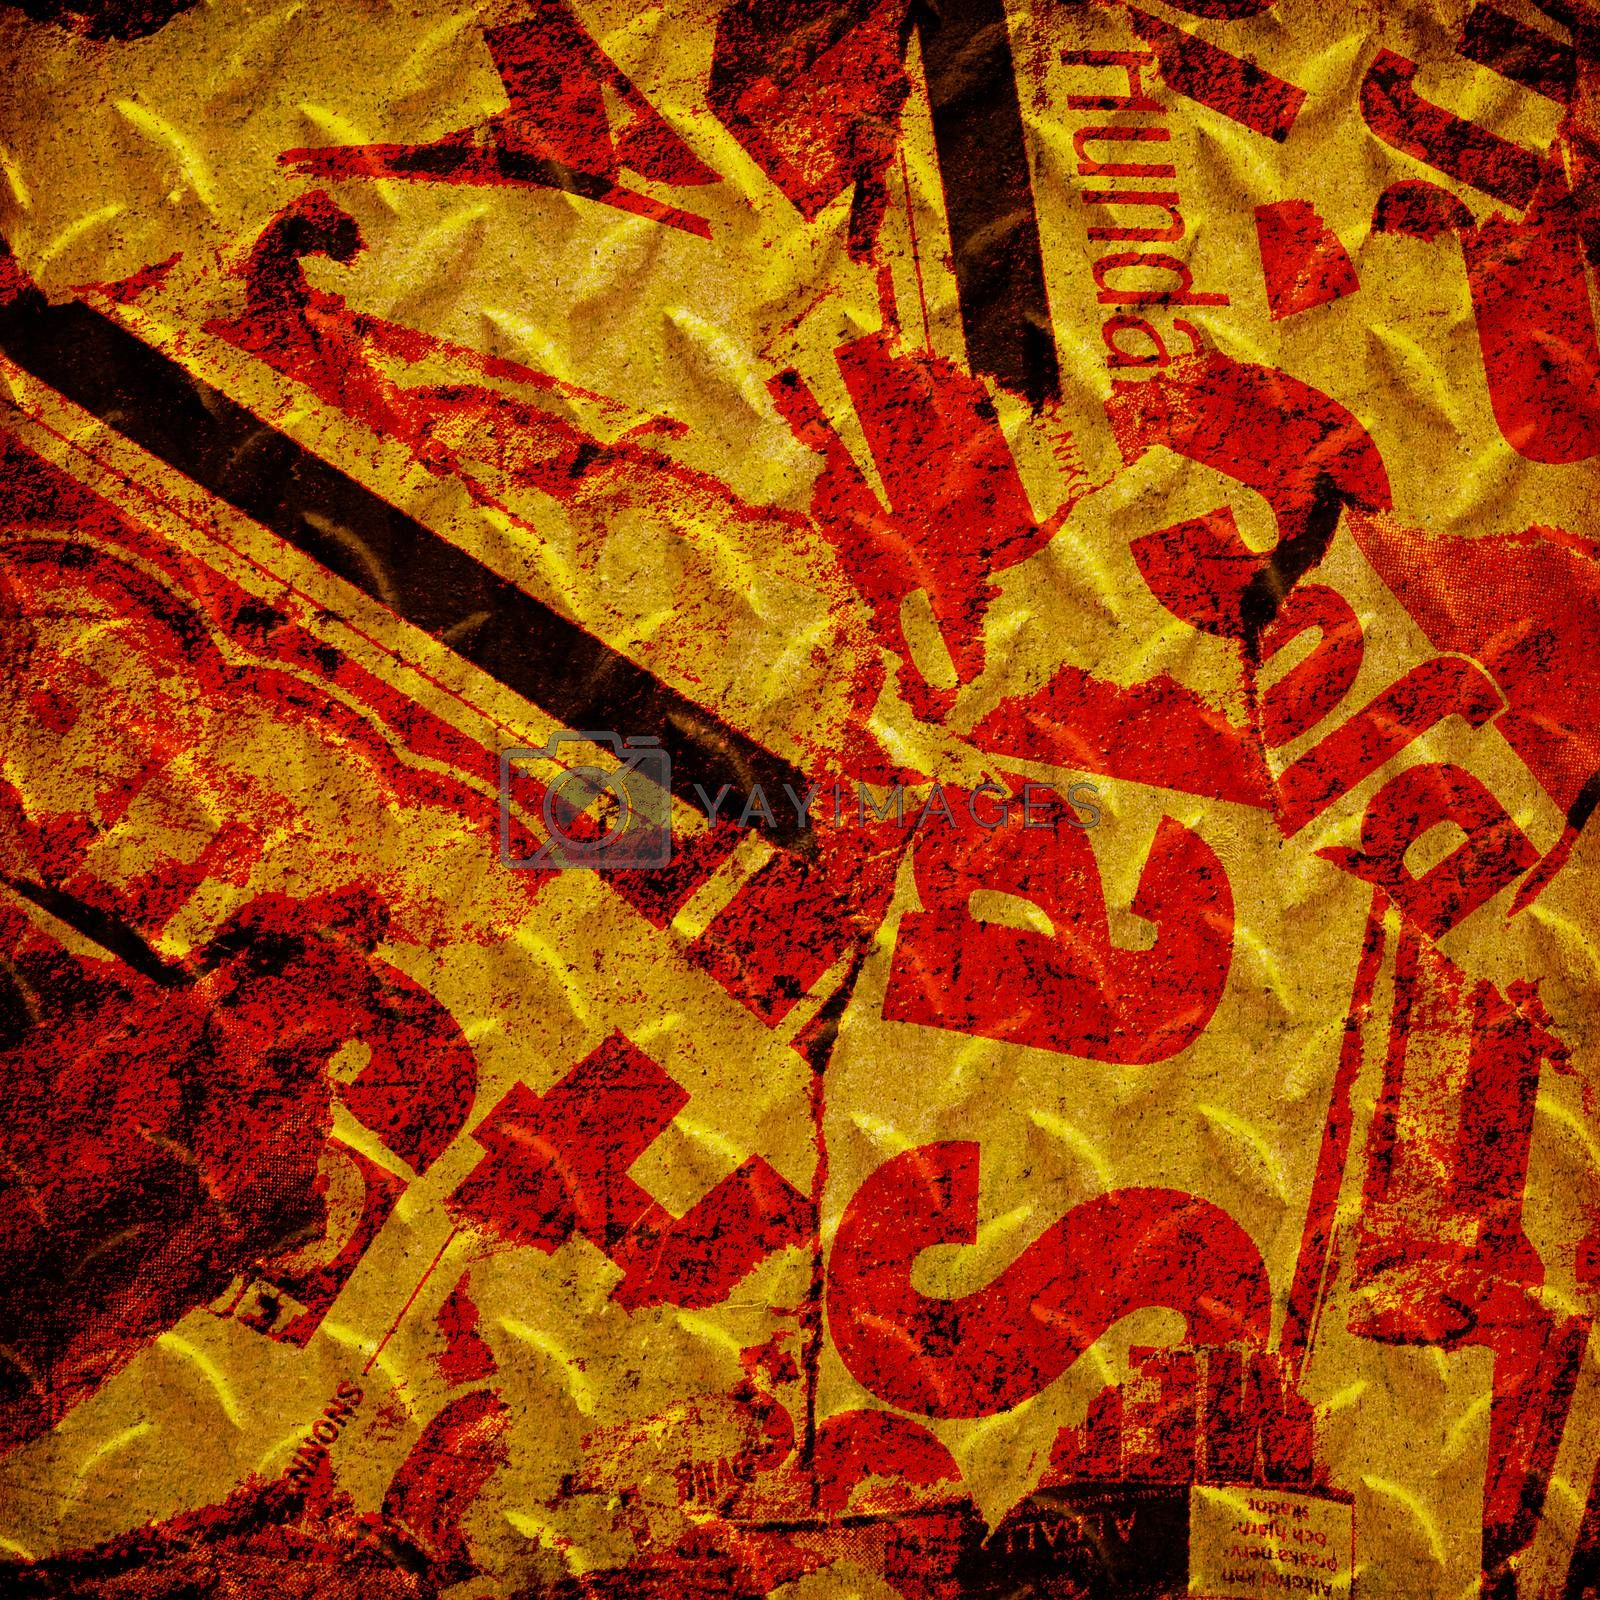 Royalty free image of Grunge red wall by wyoosumran